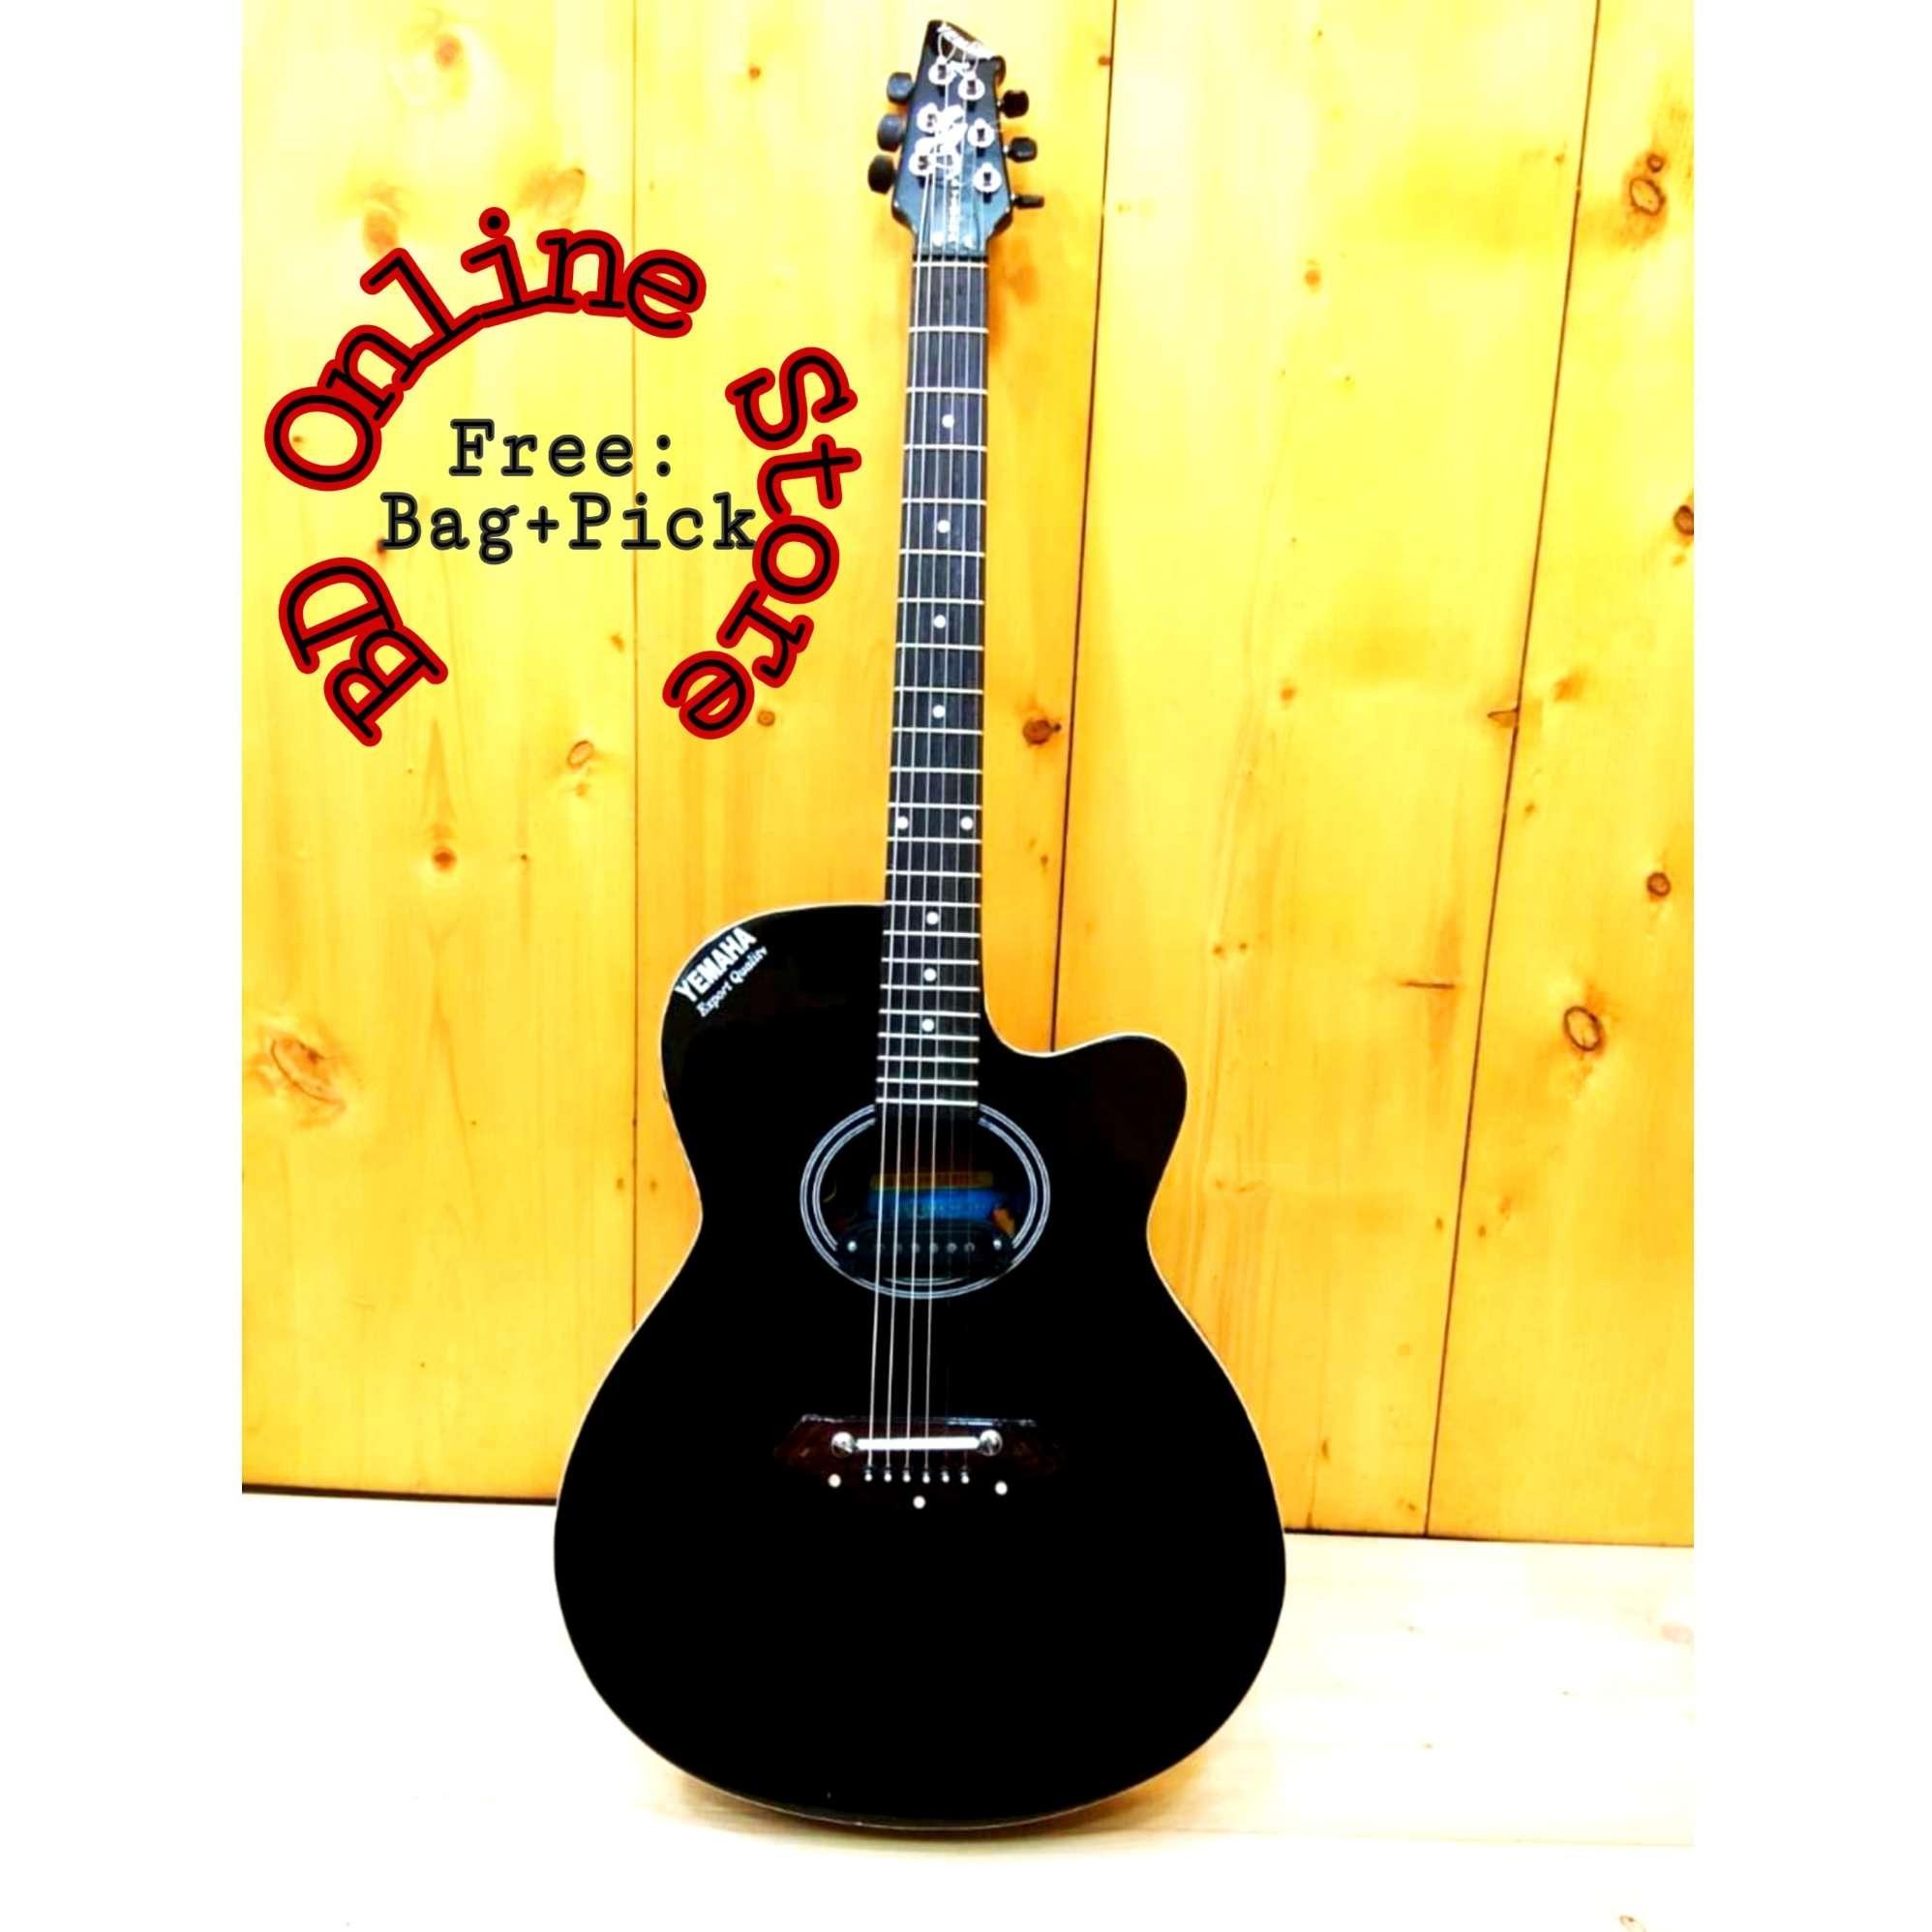 New Yamaha CM2 Acoustic Guitar with bag